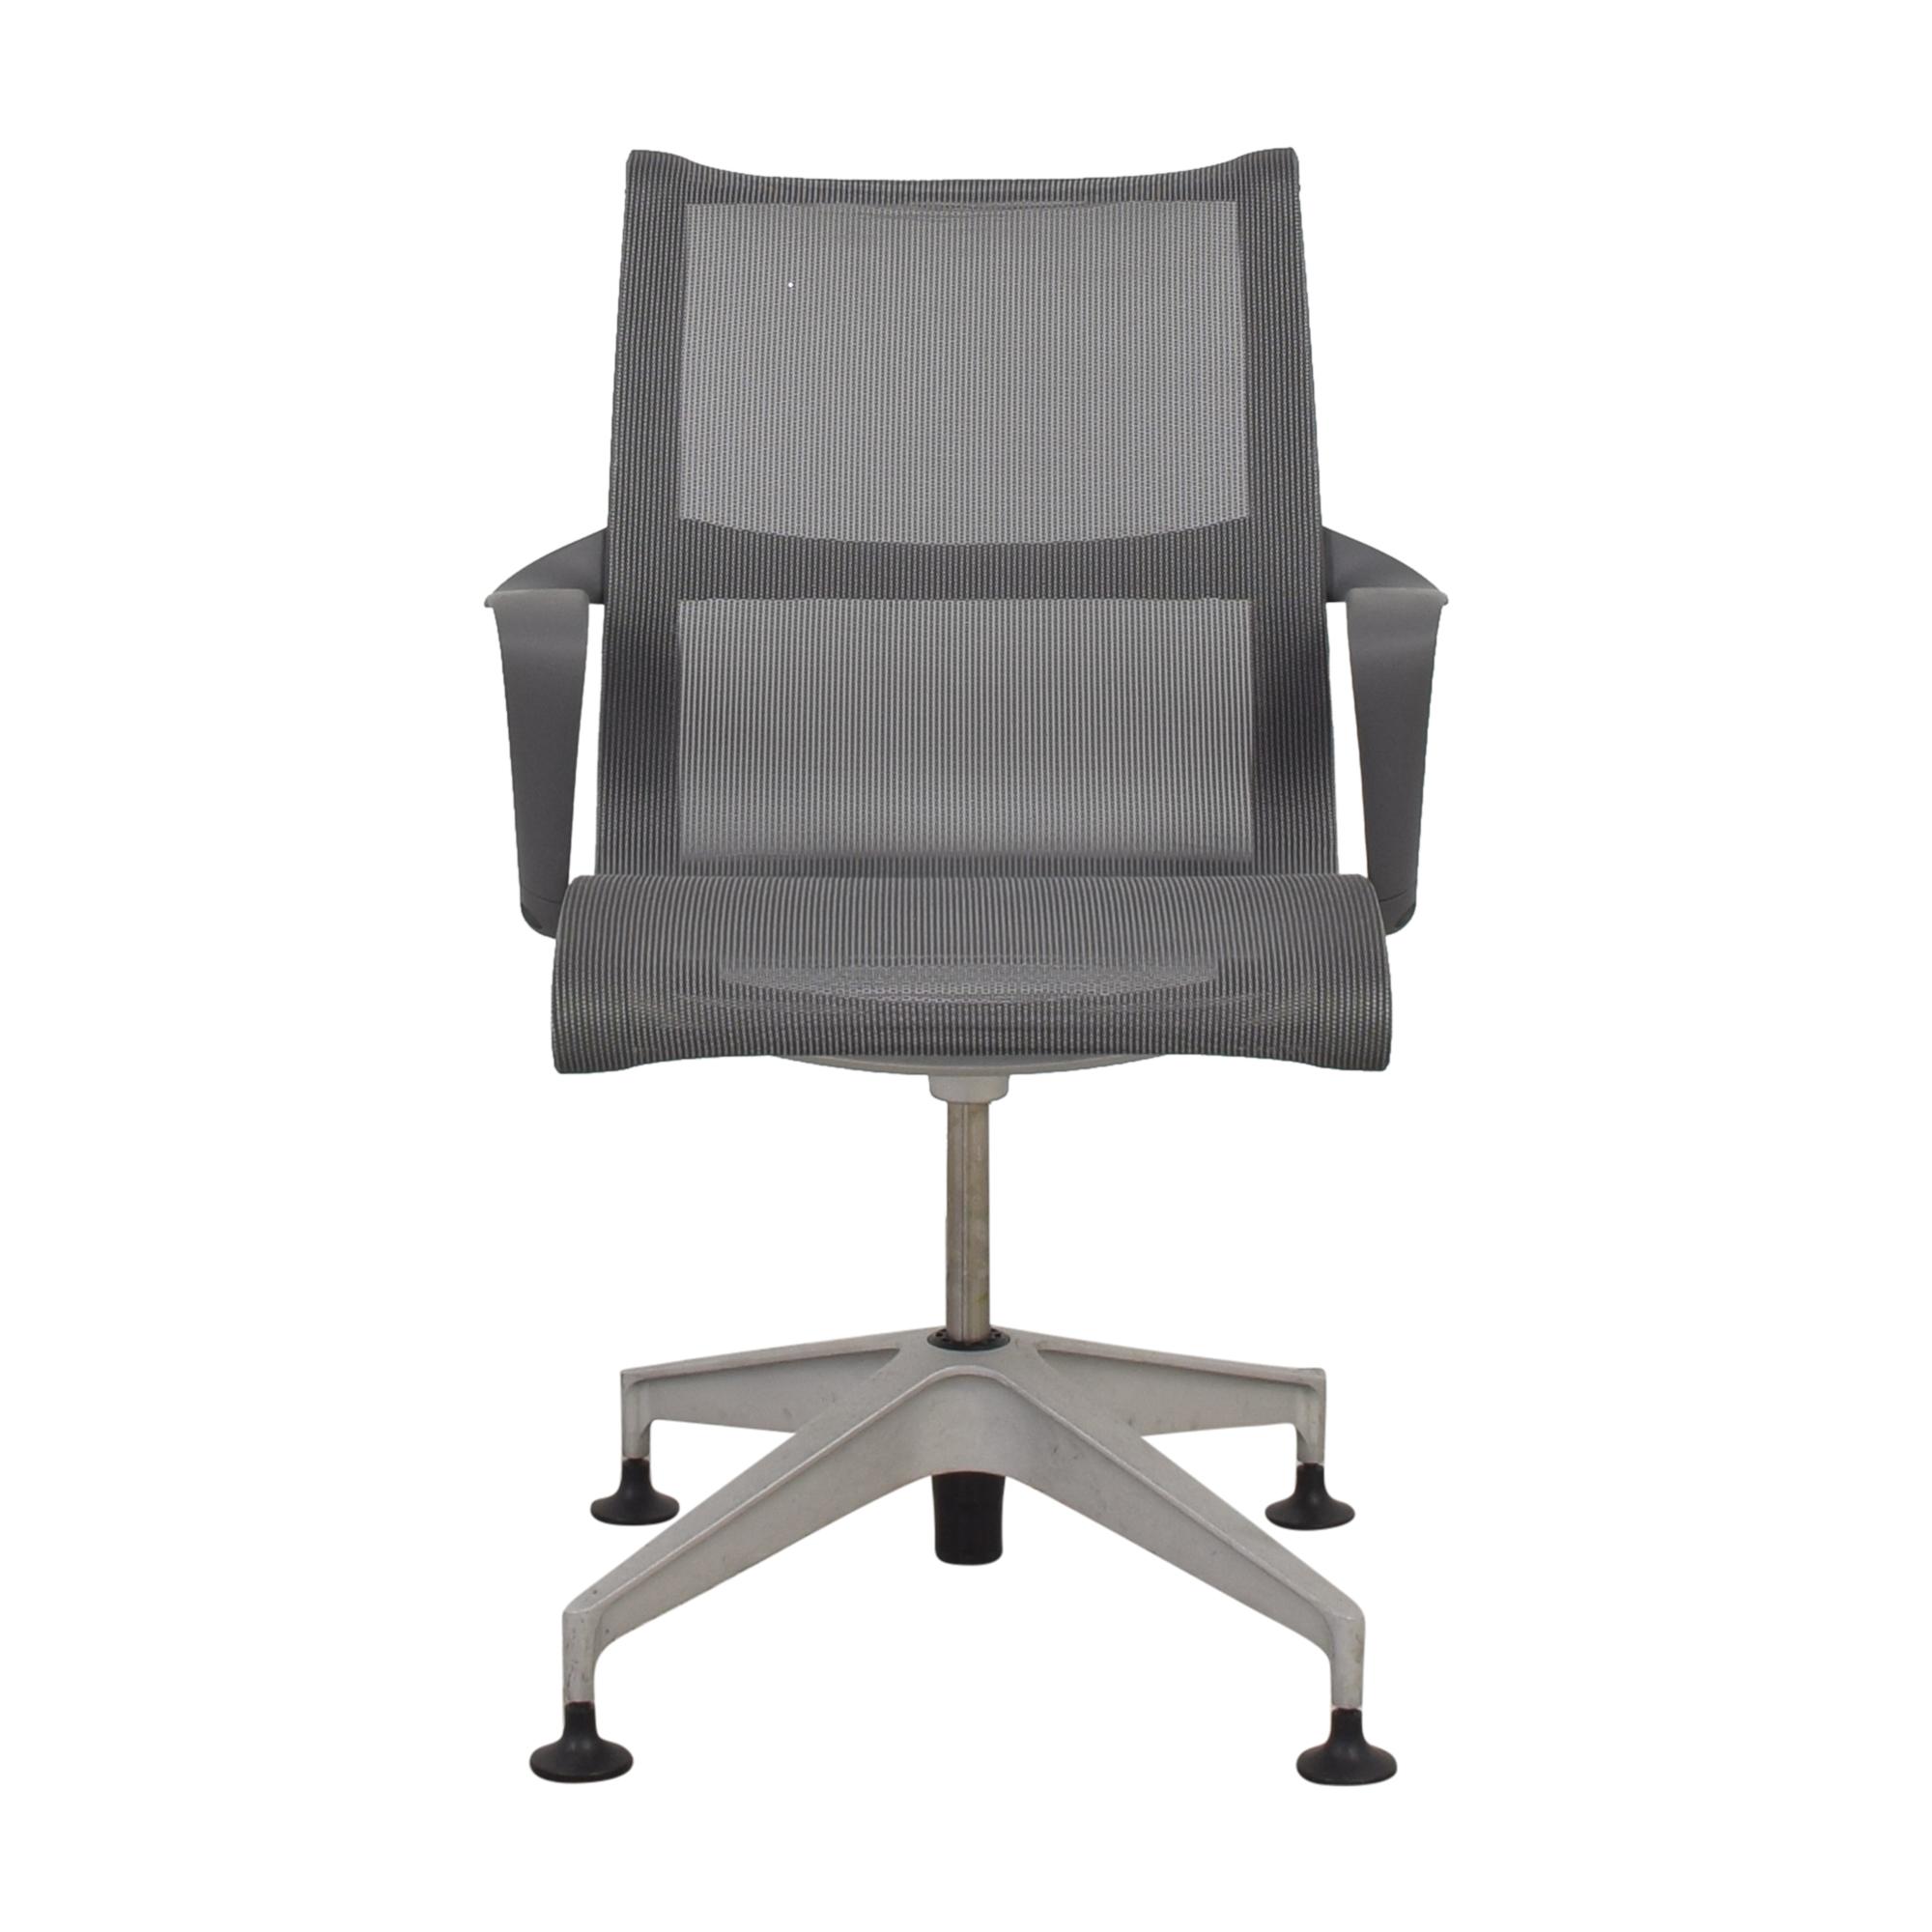 Herman Miller Herman Miller Setu Chair coupon